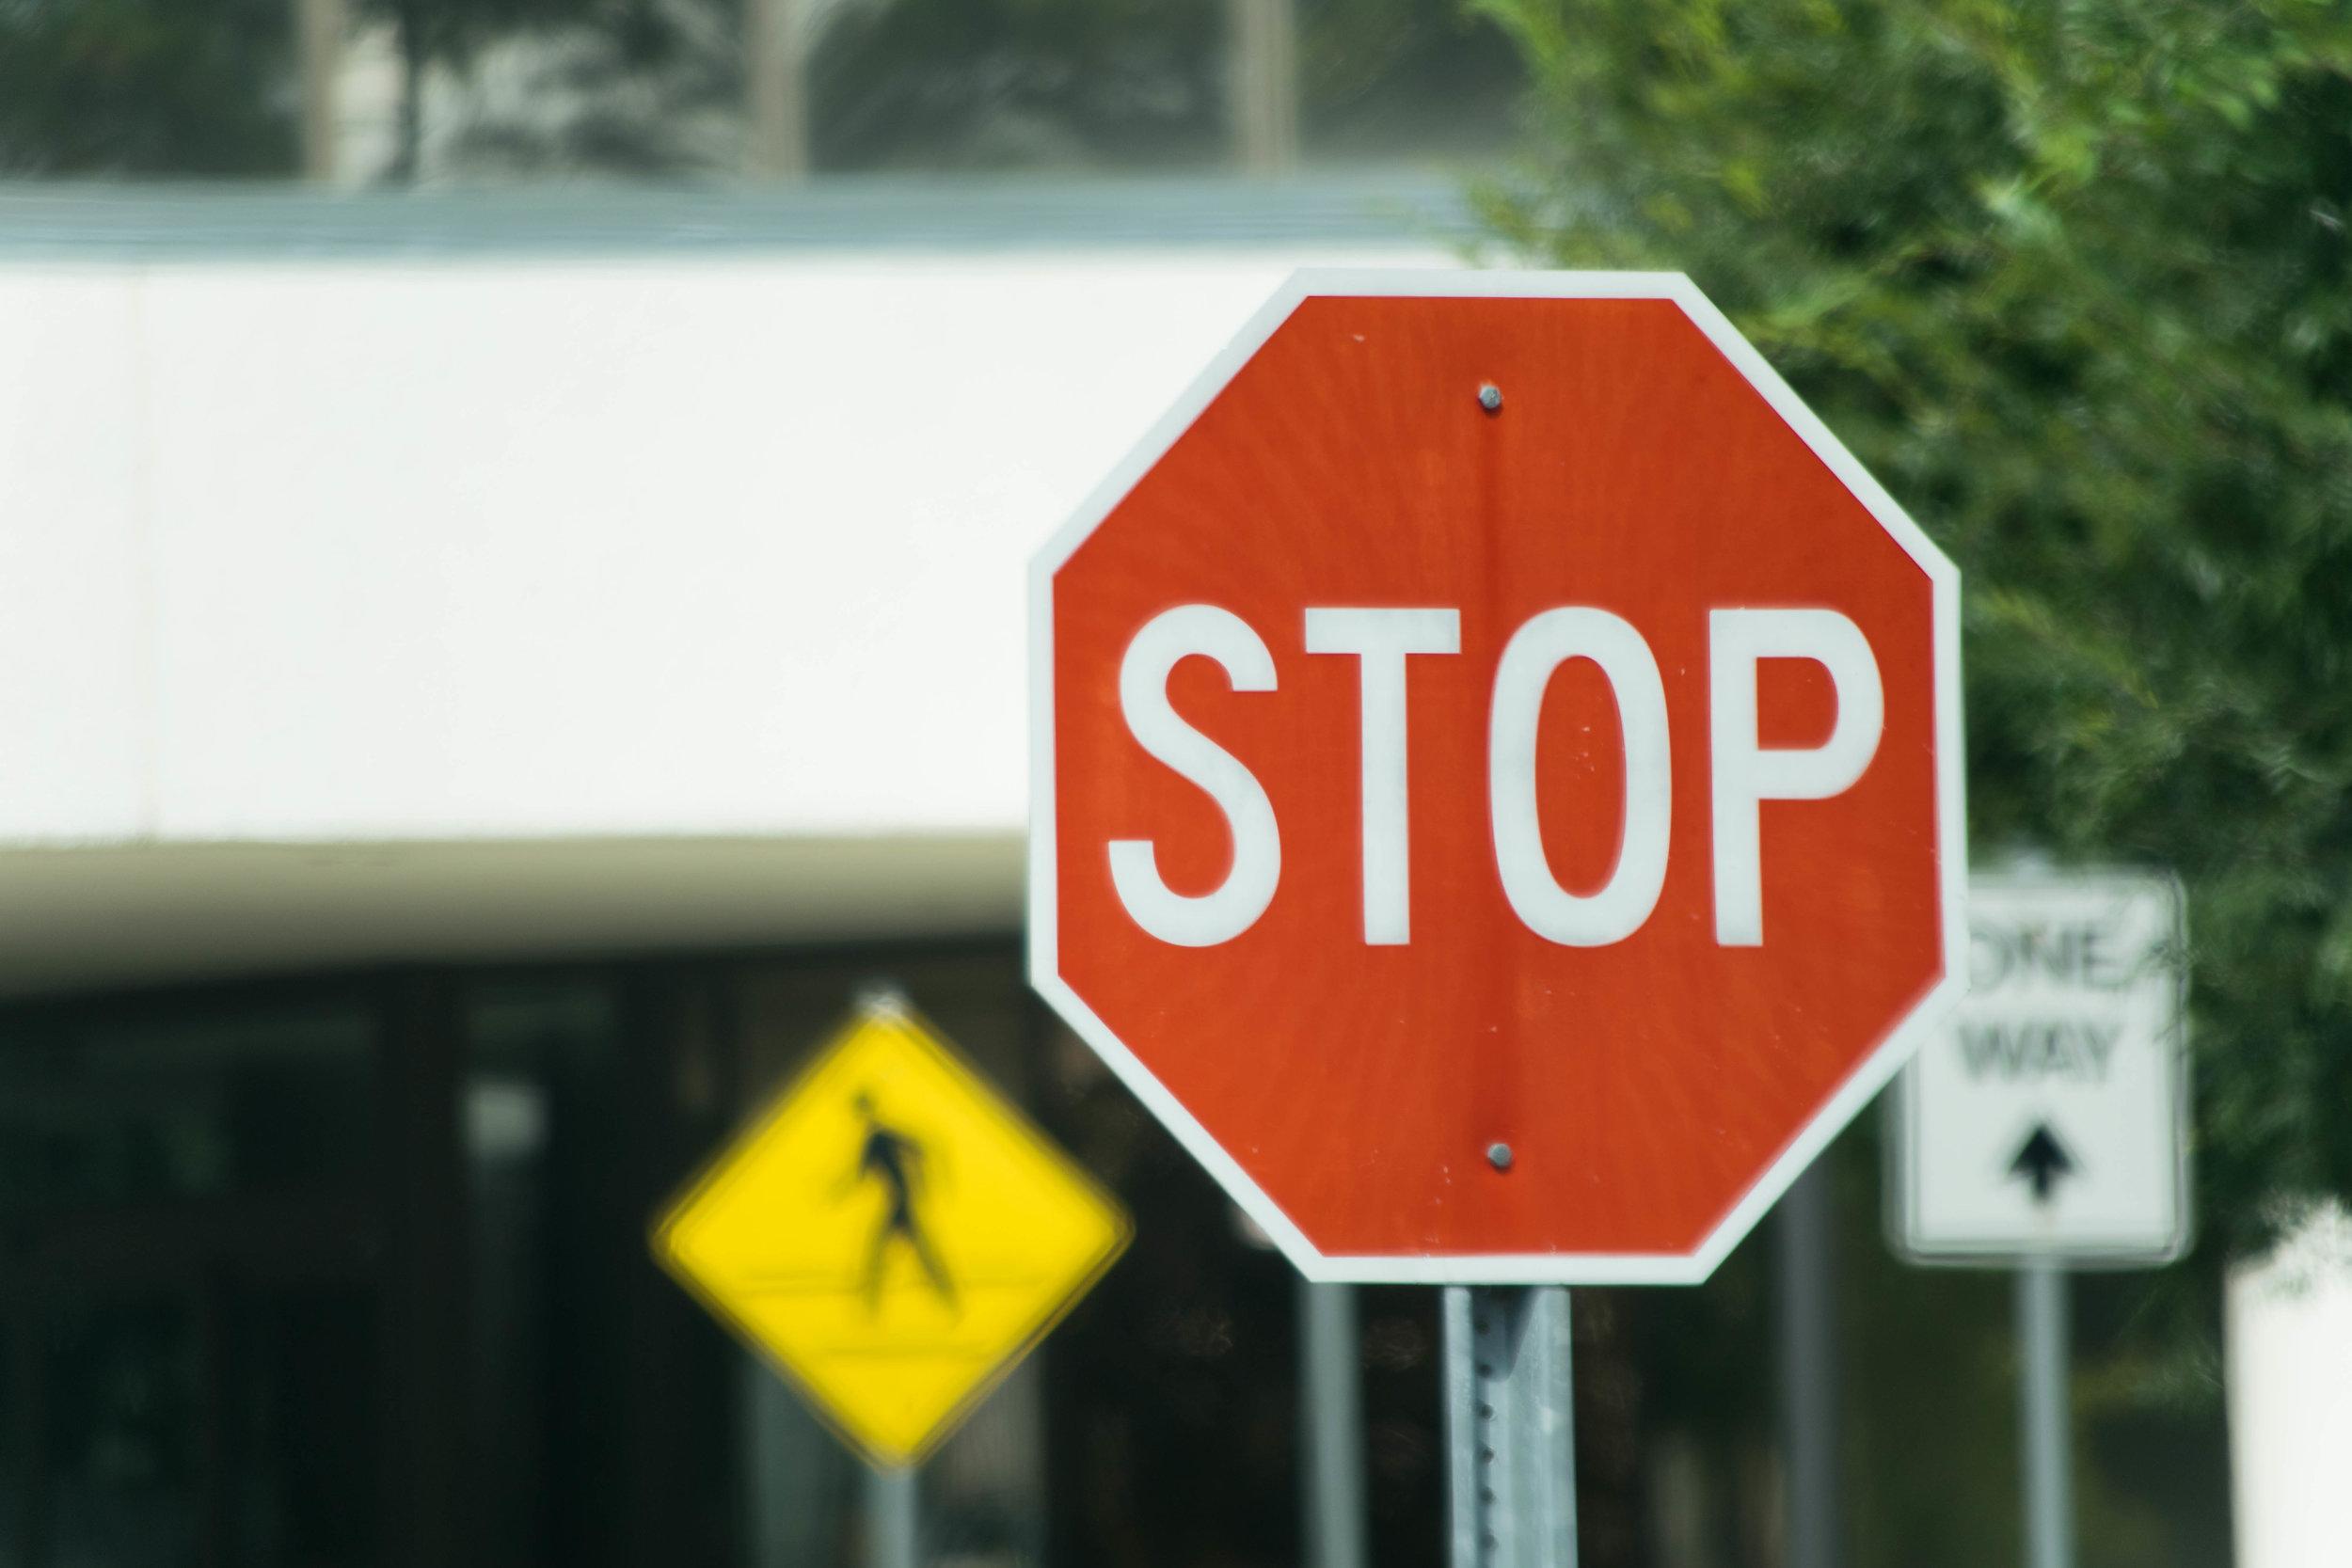 Signs & Traffic Signals